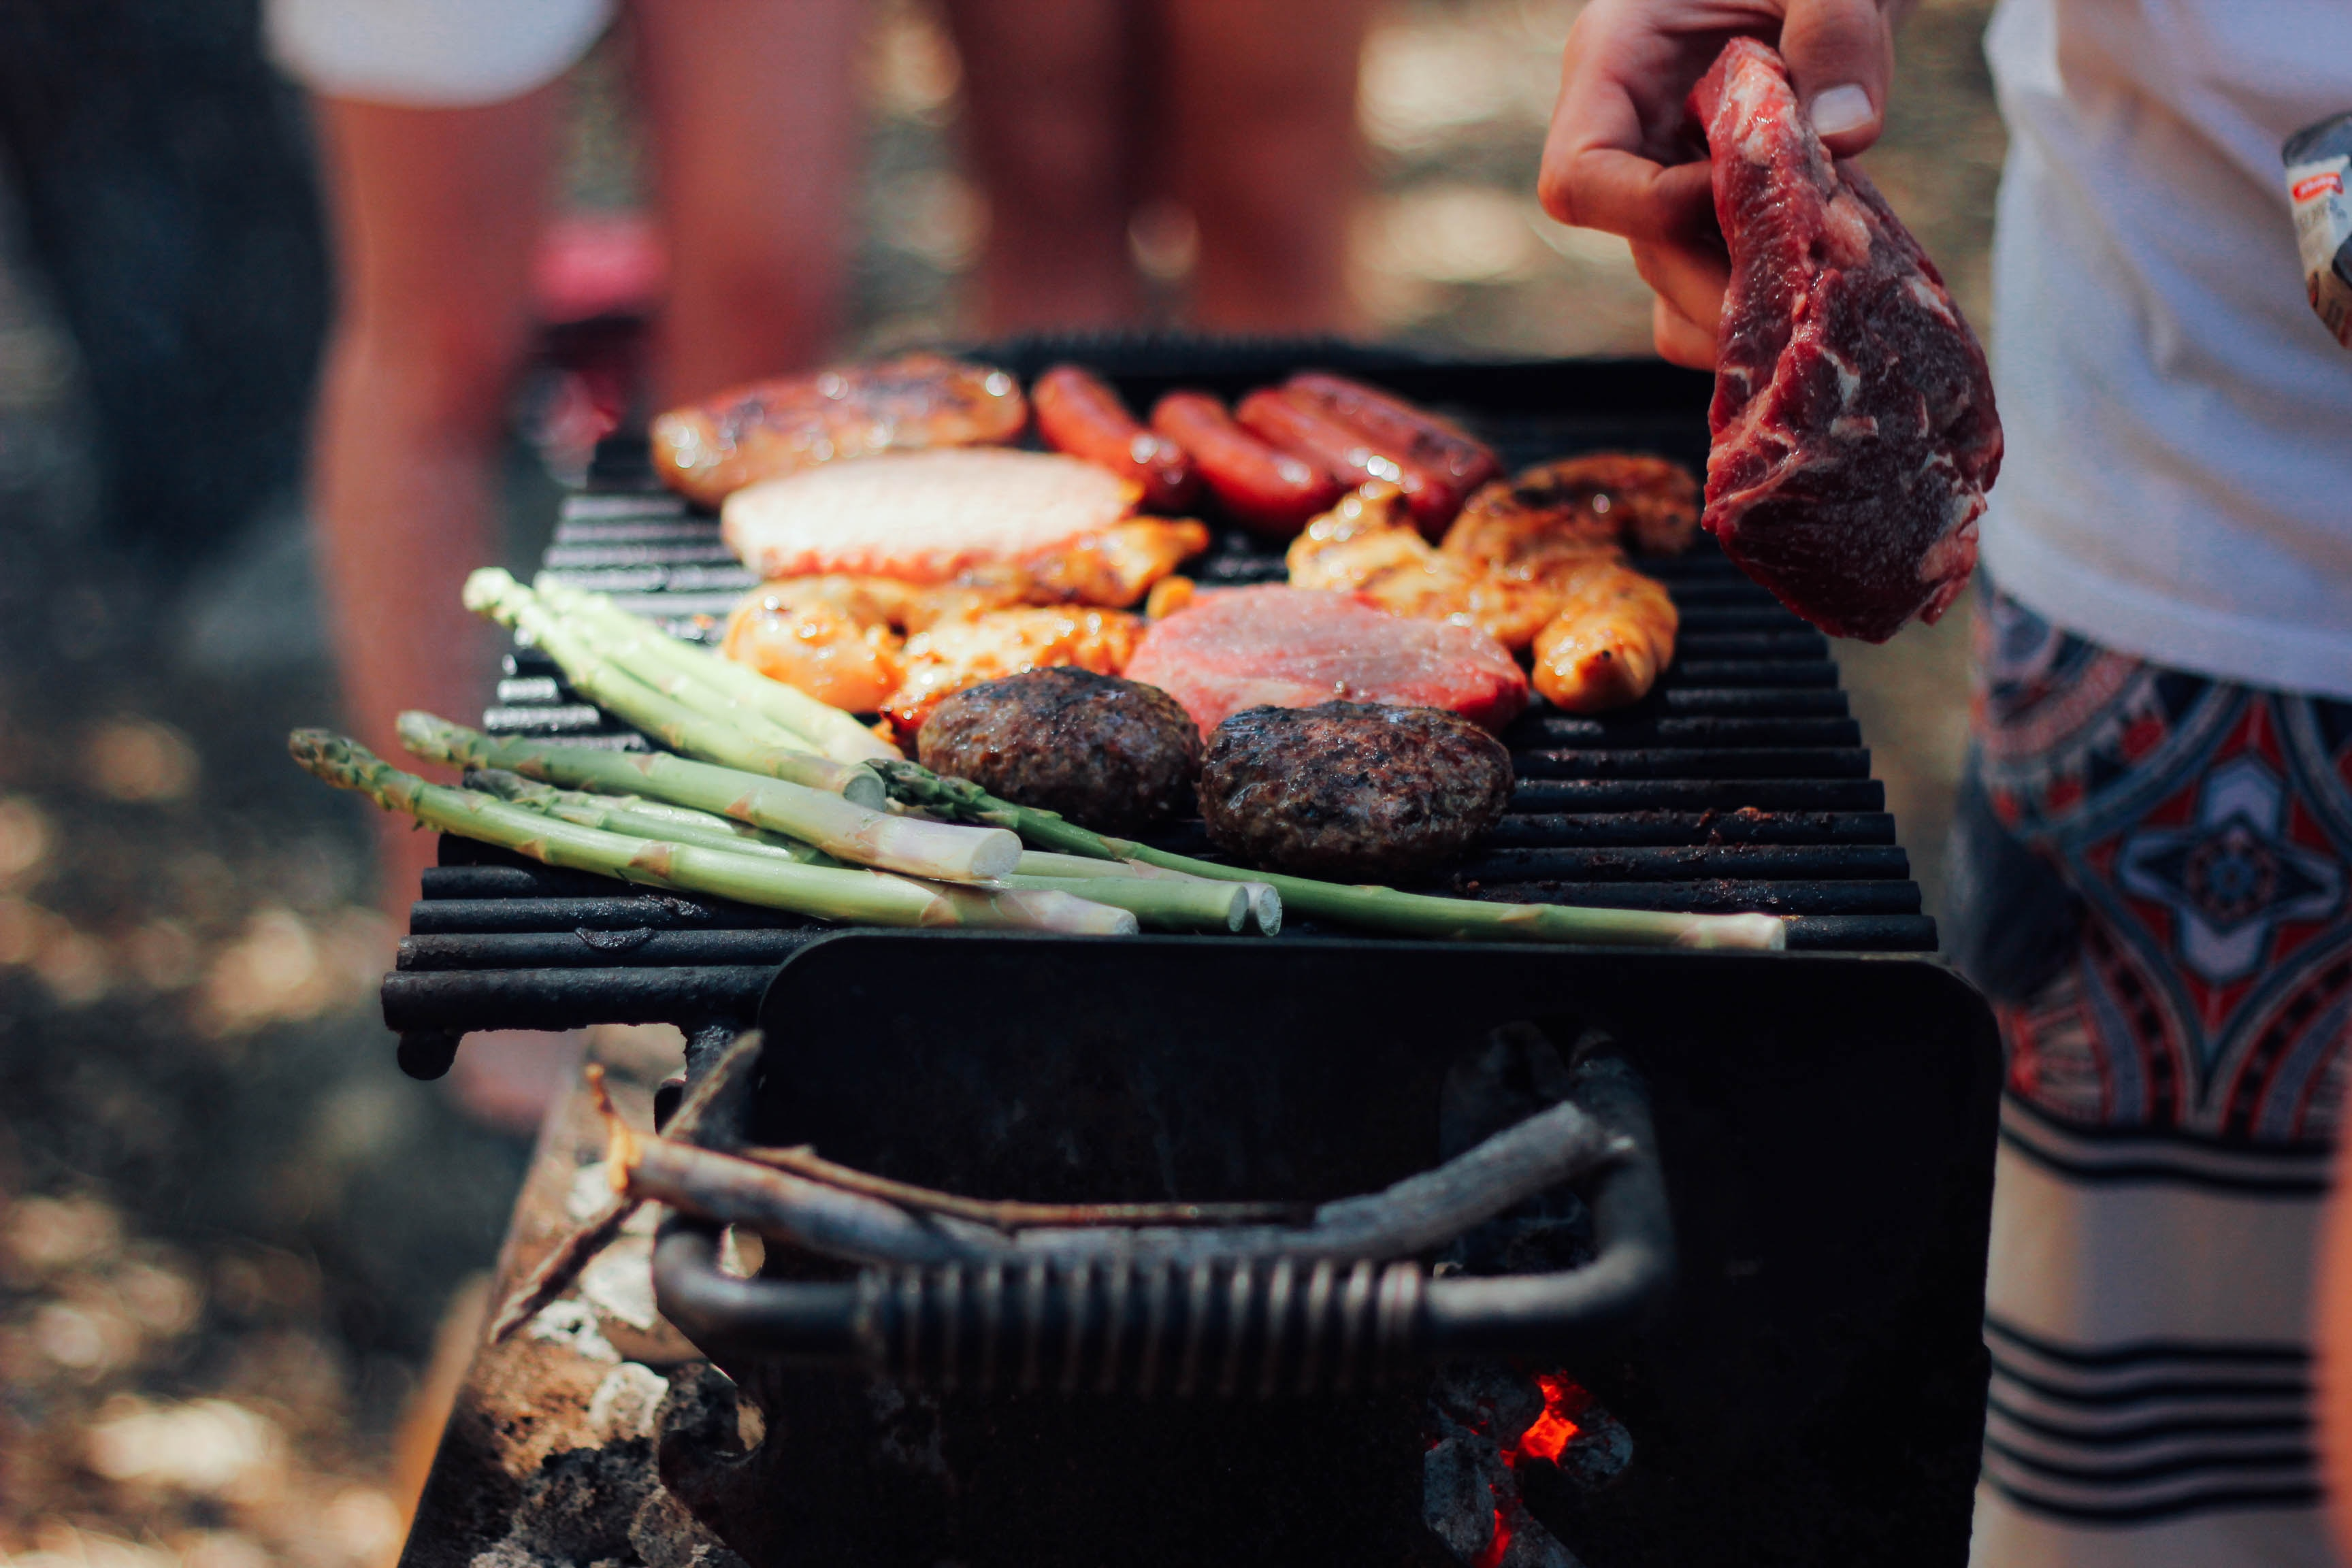 Keto meats